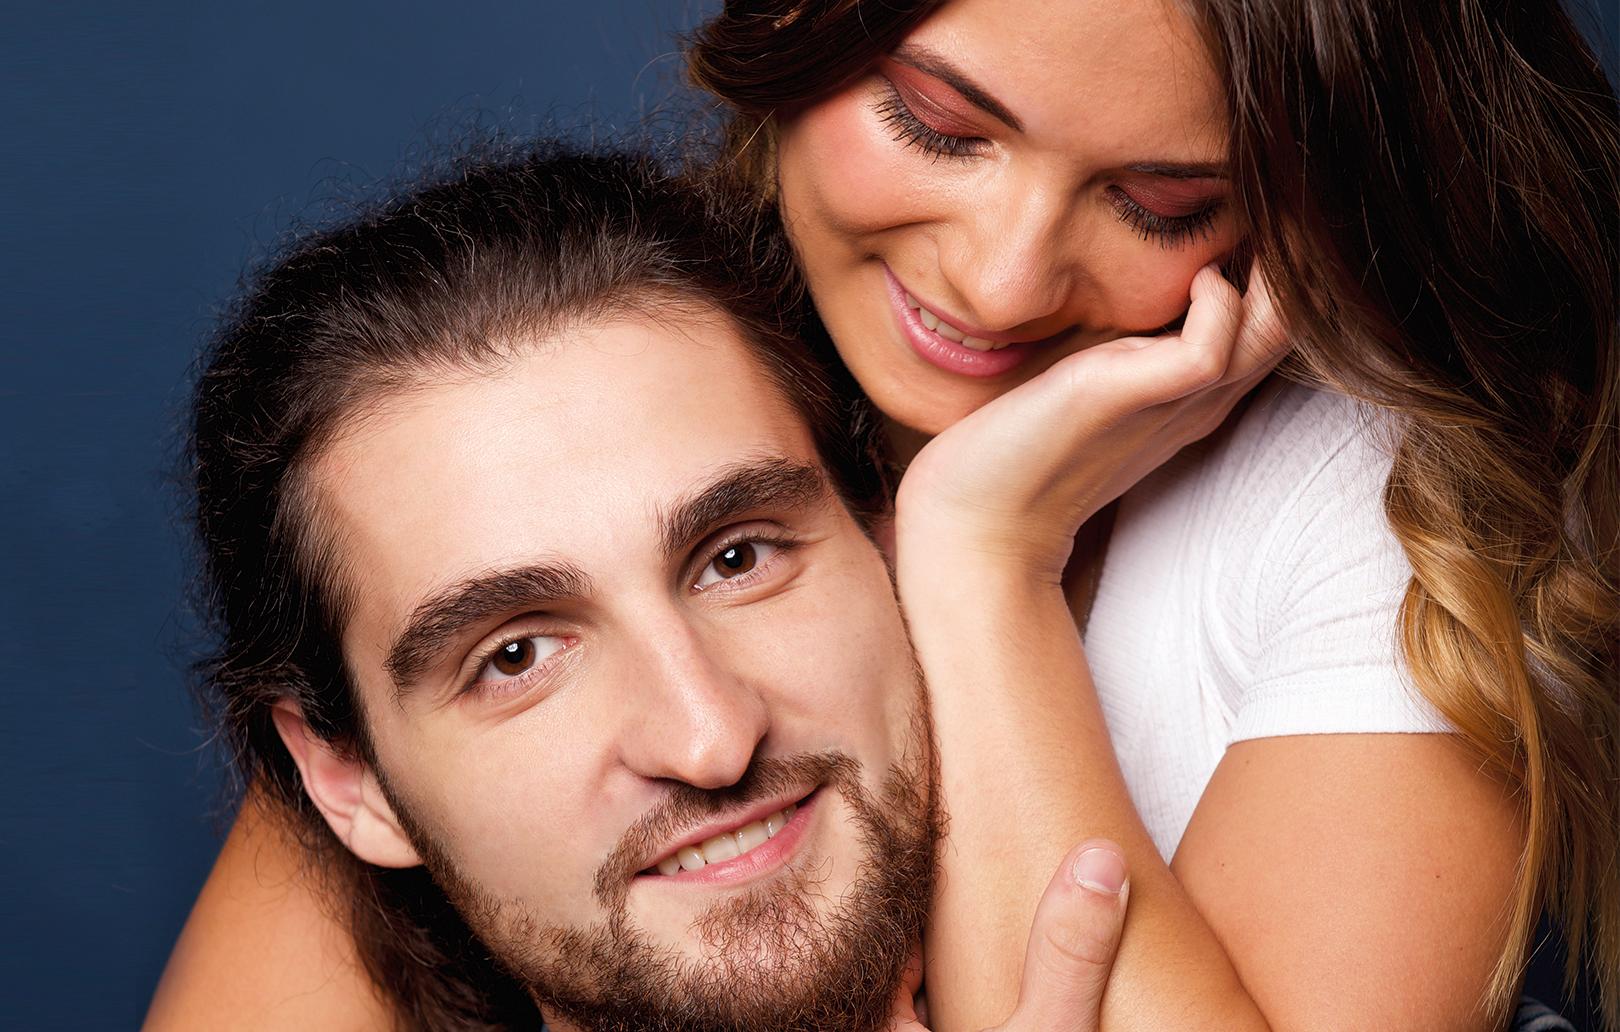 partner-fotoshooting-muenchen-bg11617892659